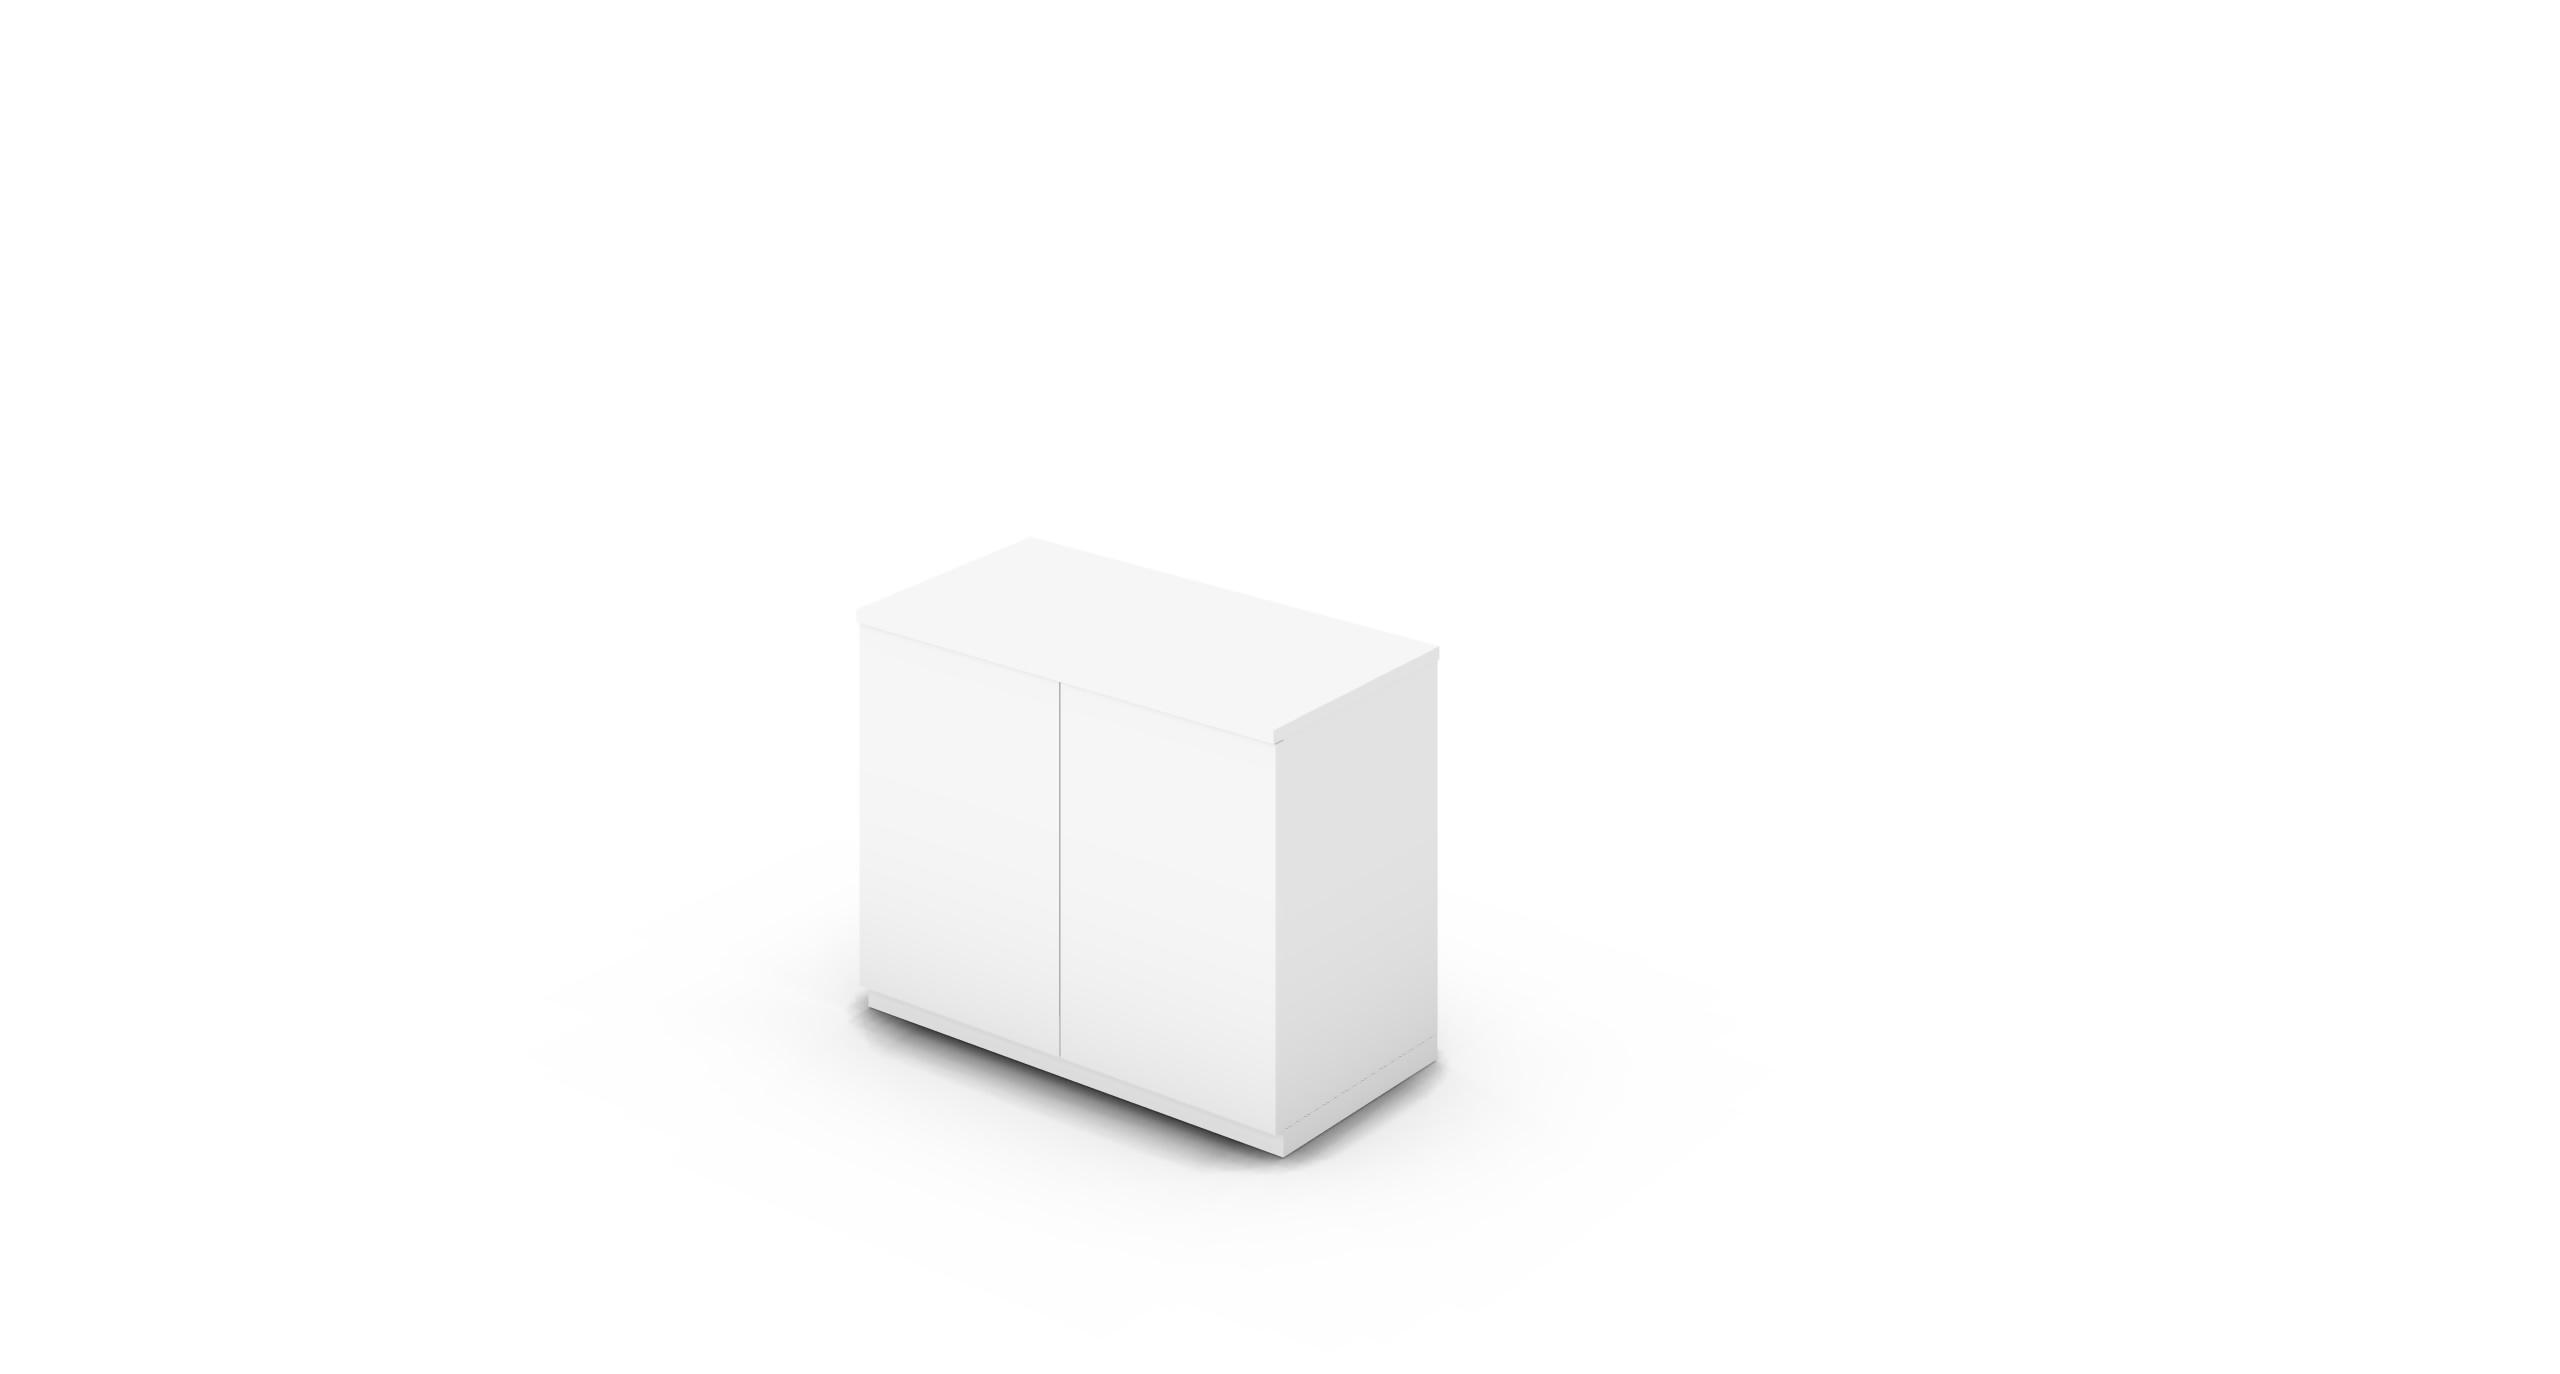 Cabinet_900x450x775_HD_White_Push_NoCylinder